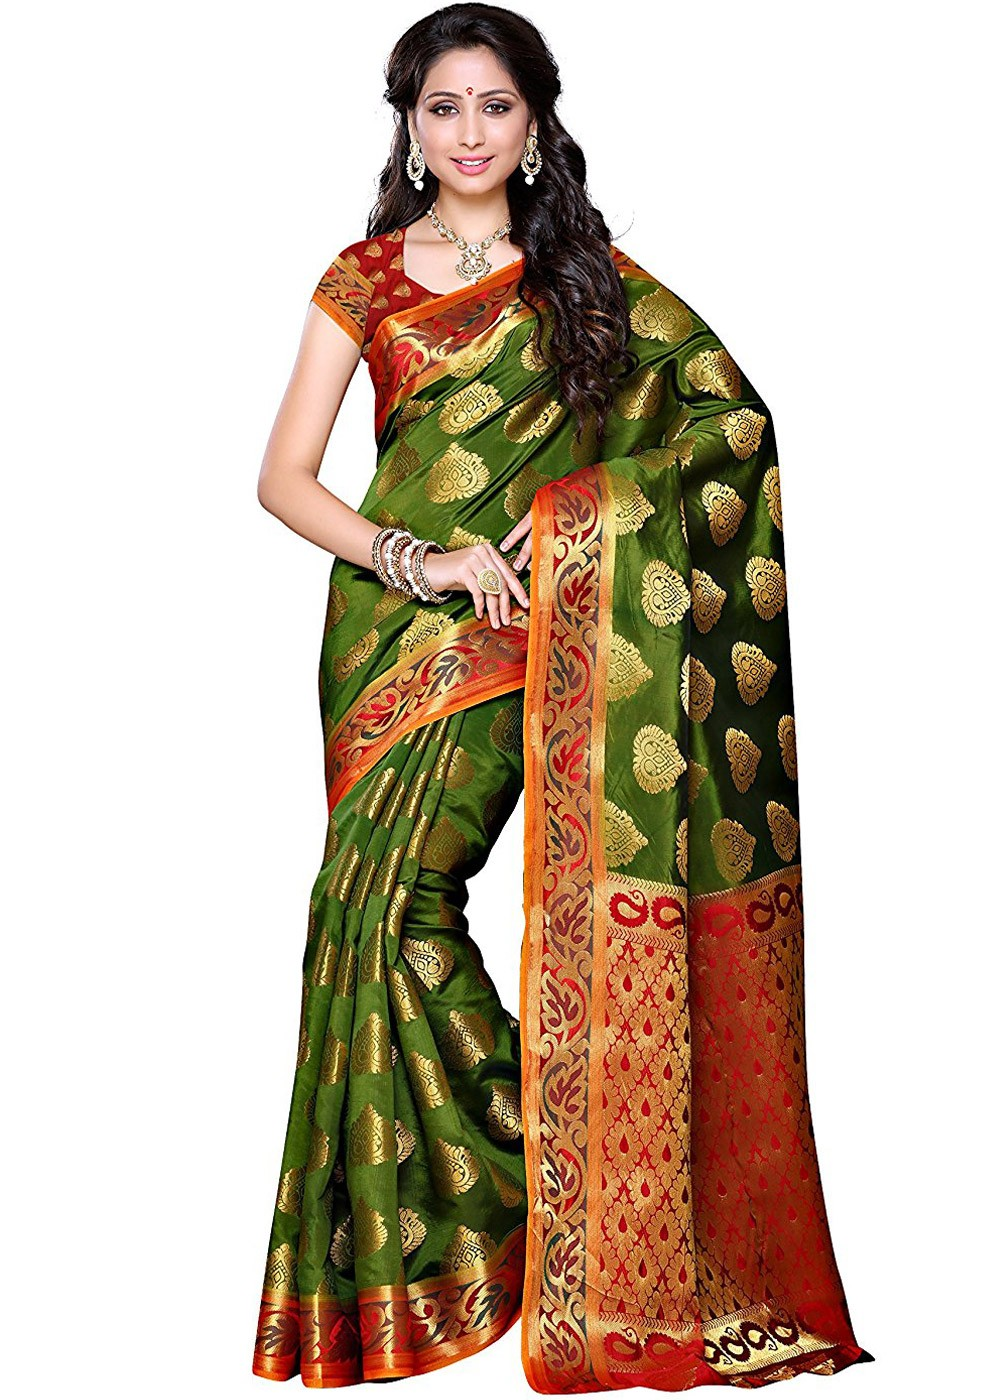 e48a342dfe5292 Olive Green Kanjivaram Silk Saree with Blouse. Tap to expand